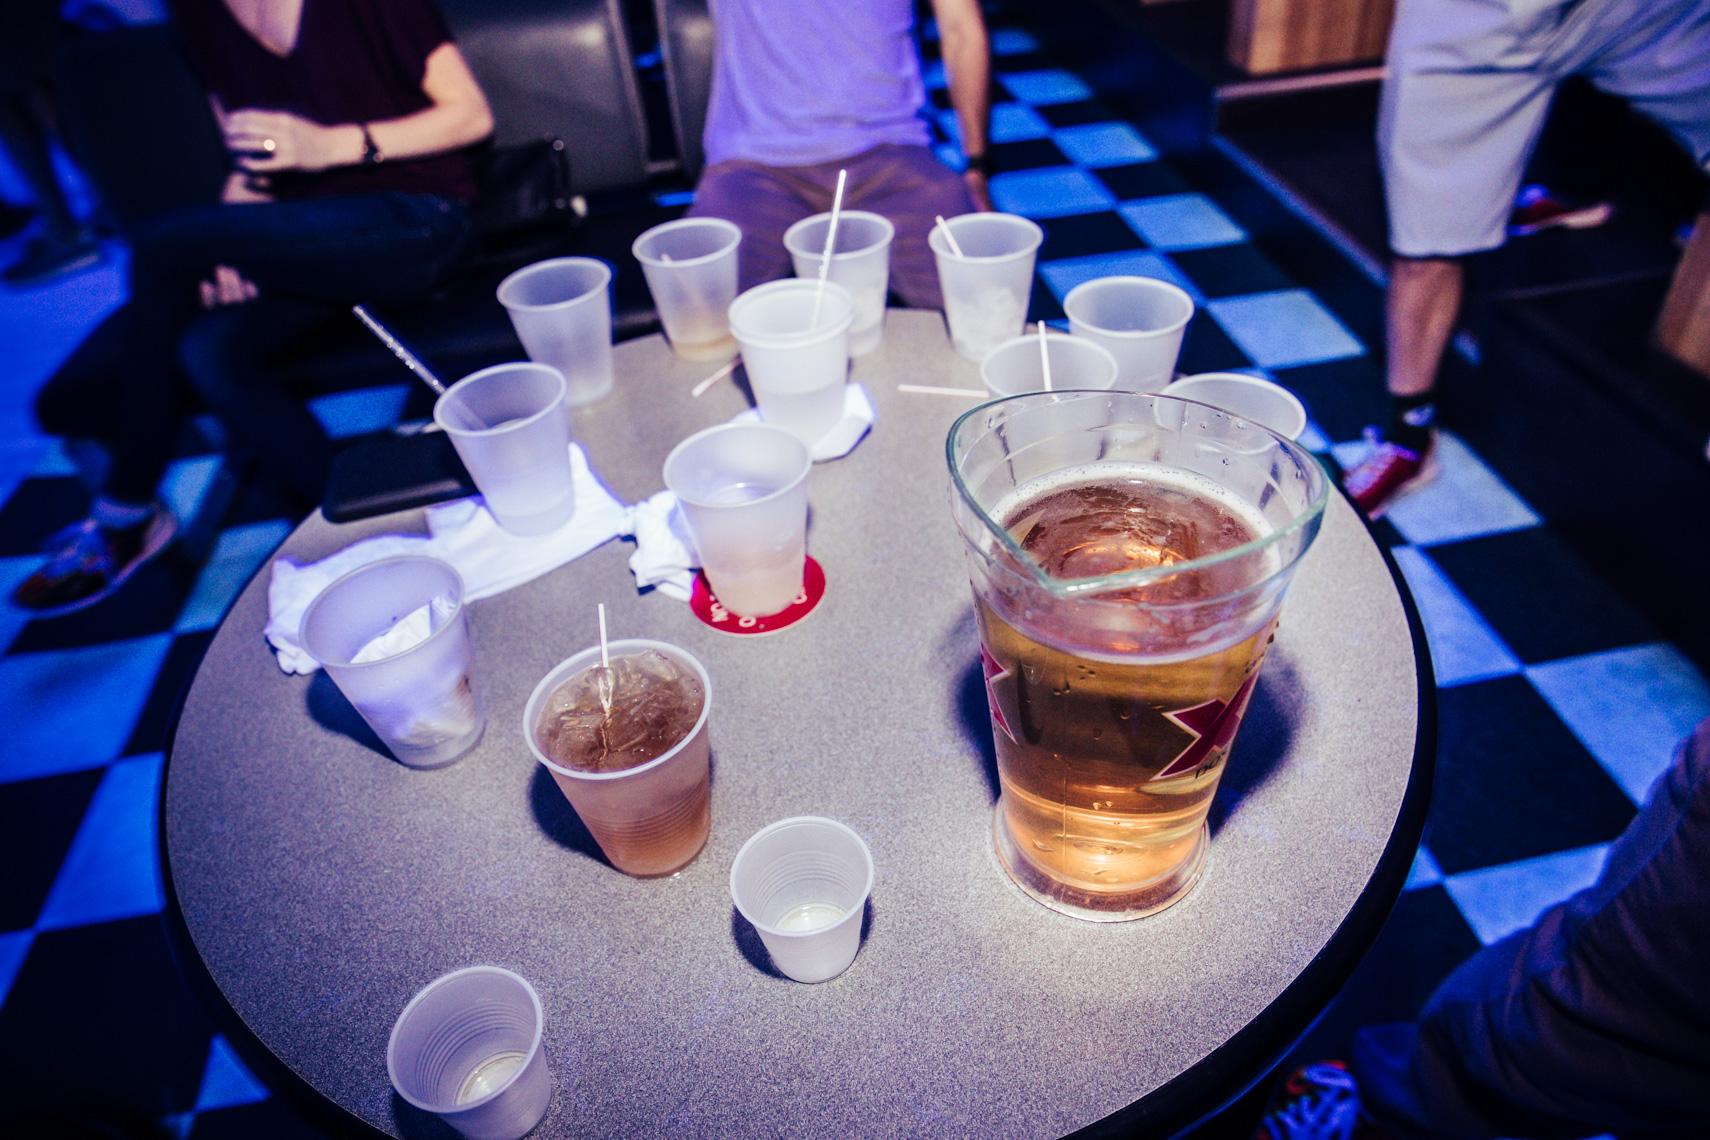 BowlingParty_3_22_19_099.jpg